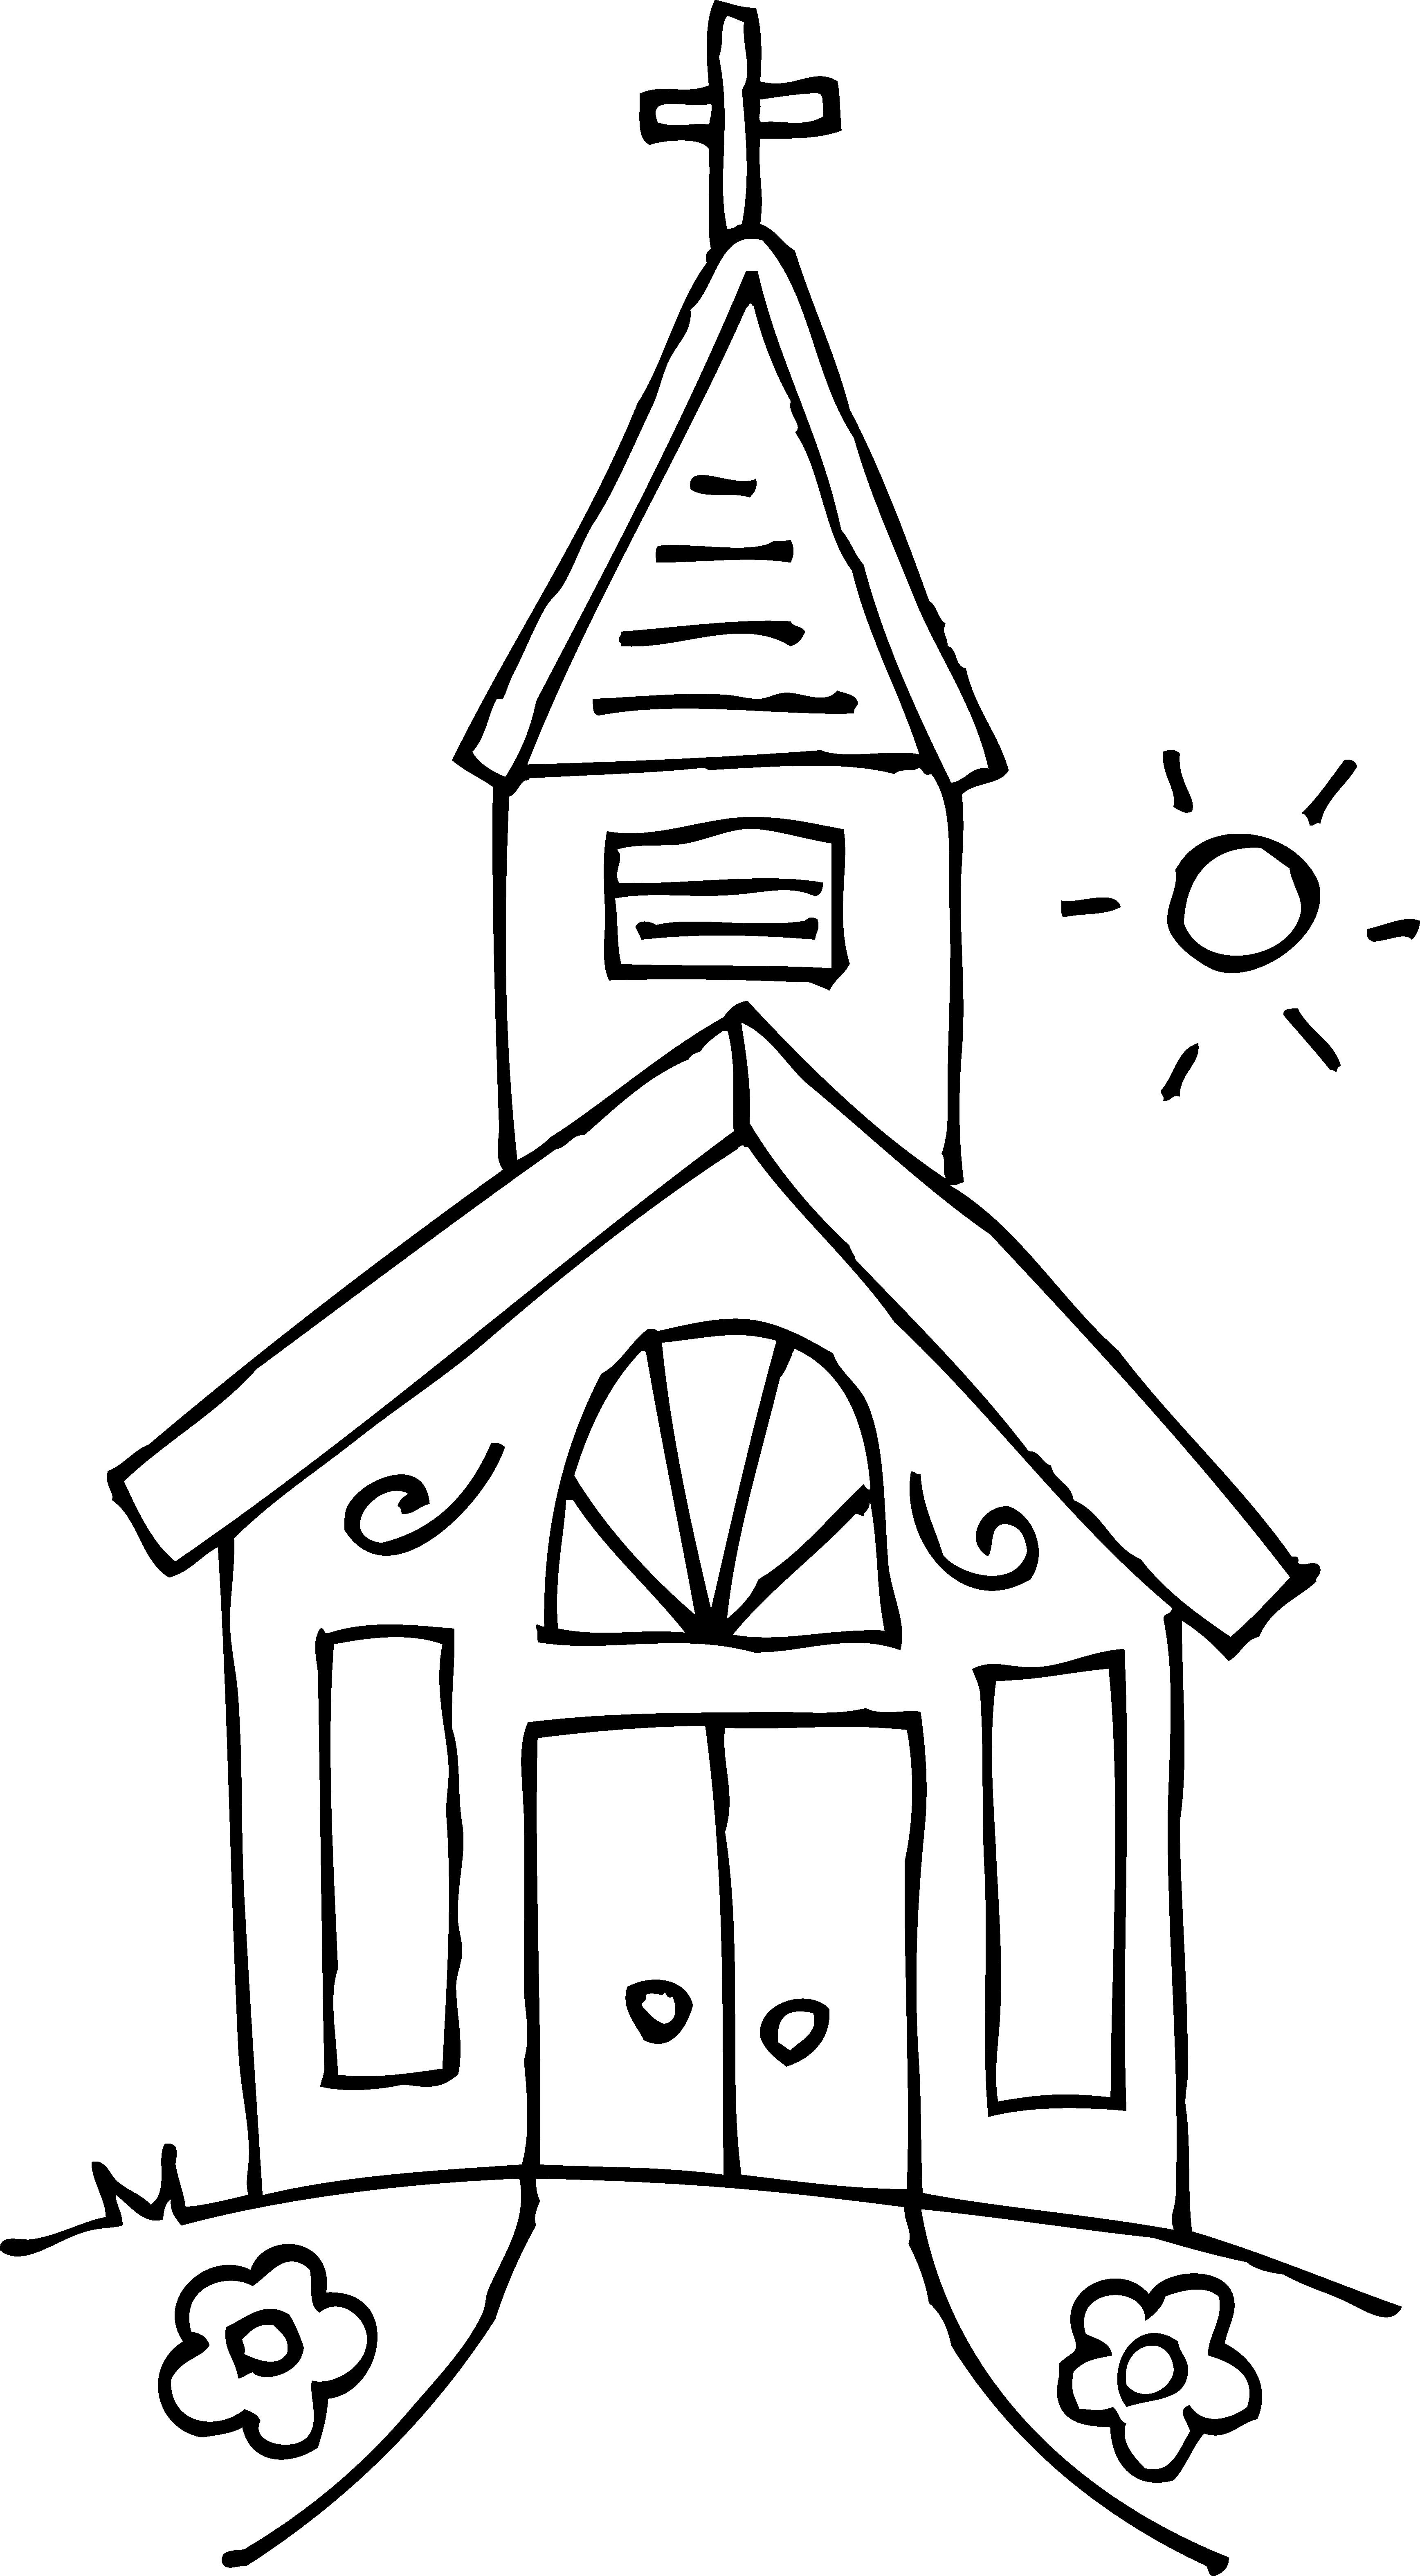 Small church clip art dromgfd top-Small church clip art dromgfd top-8